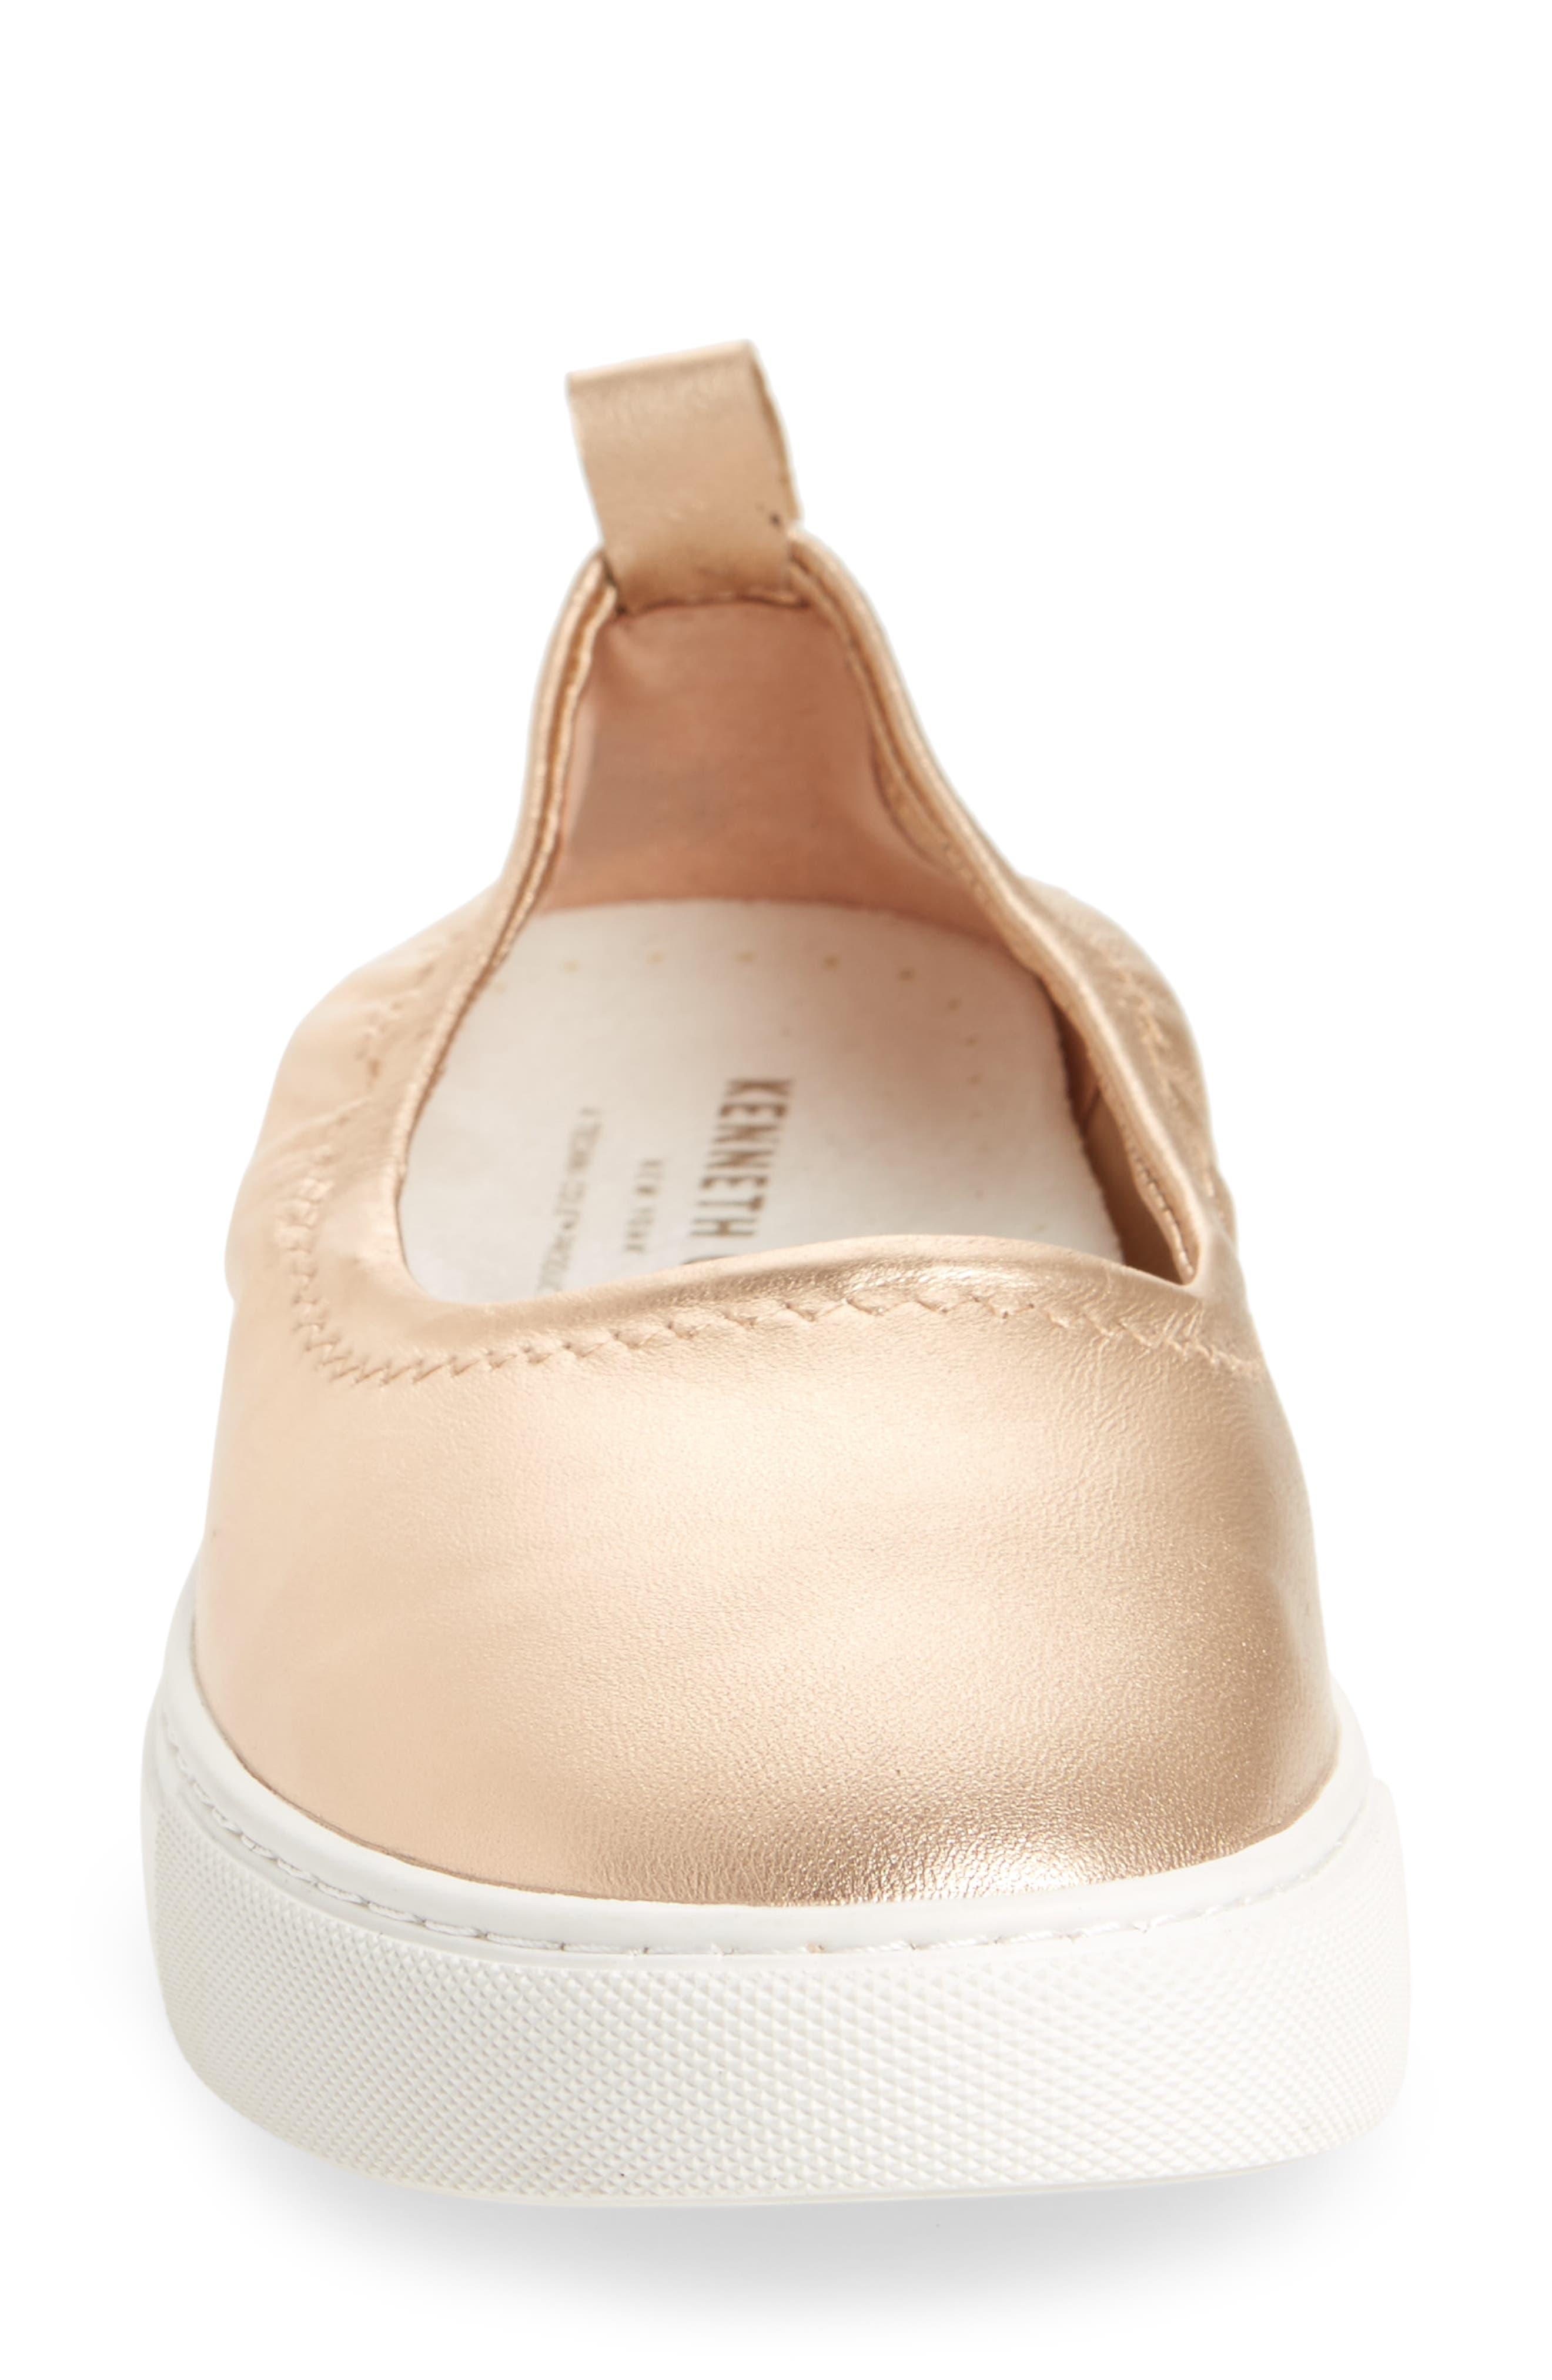 Kam Techni-Cole Ballet Flat,                             Alternate thumbnail 4, color,                             Rose Gold Leather